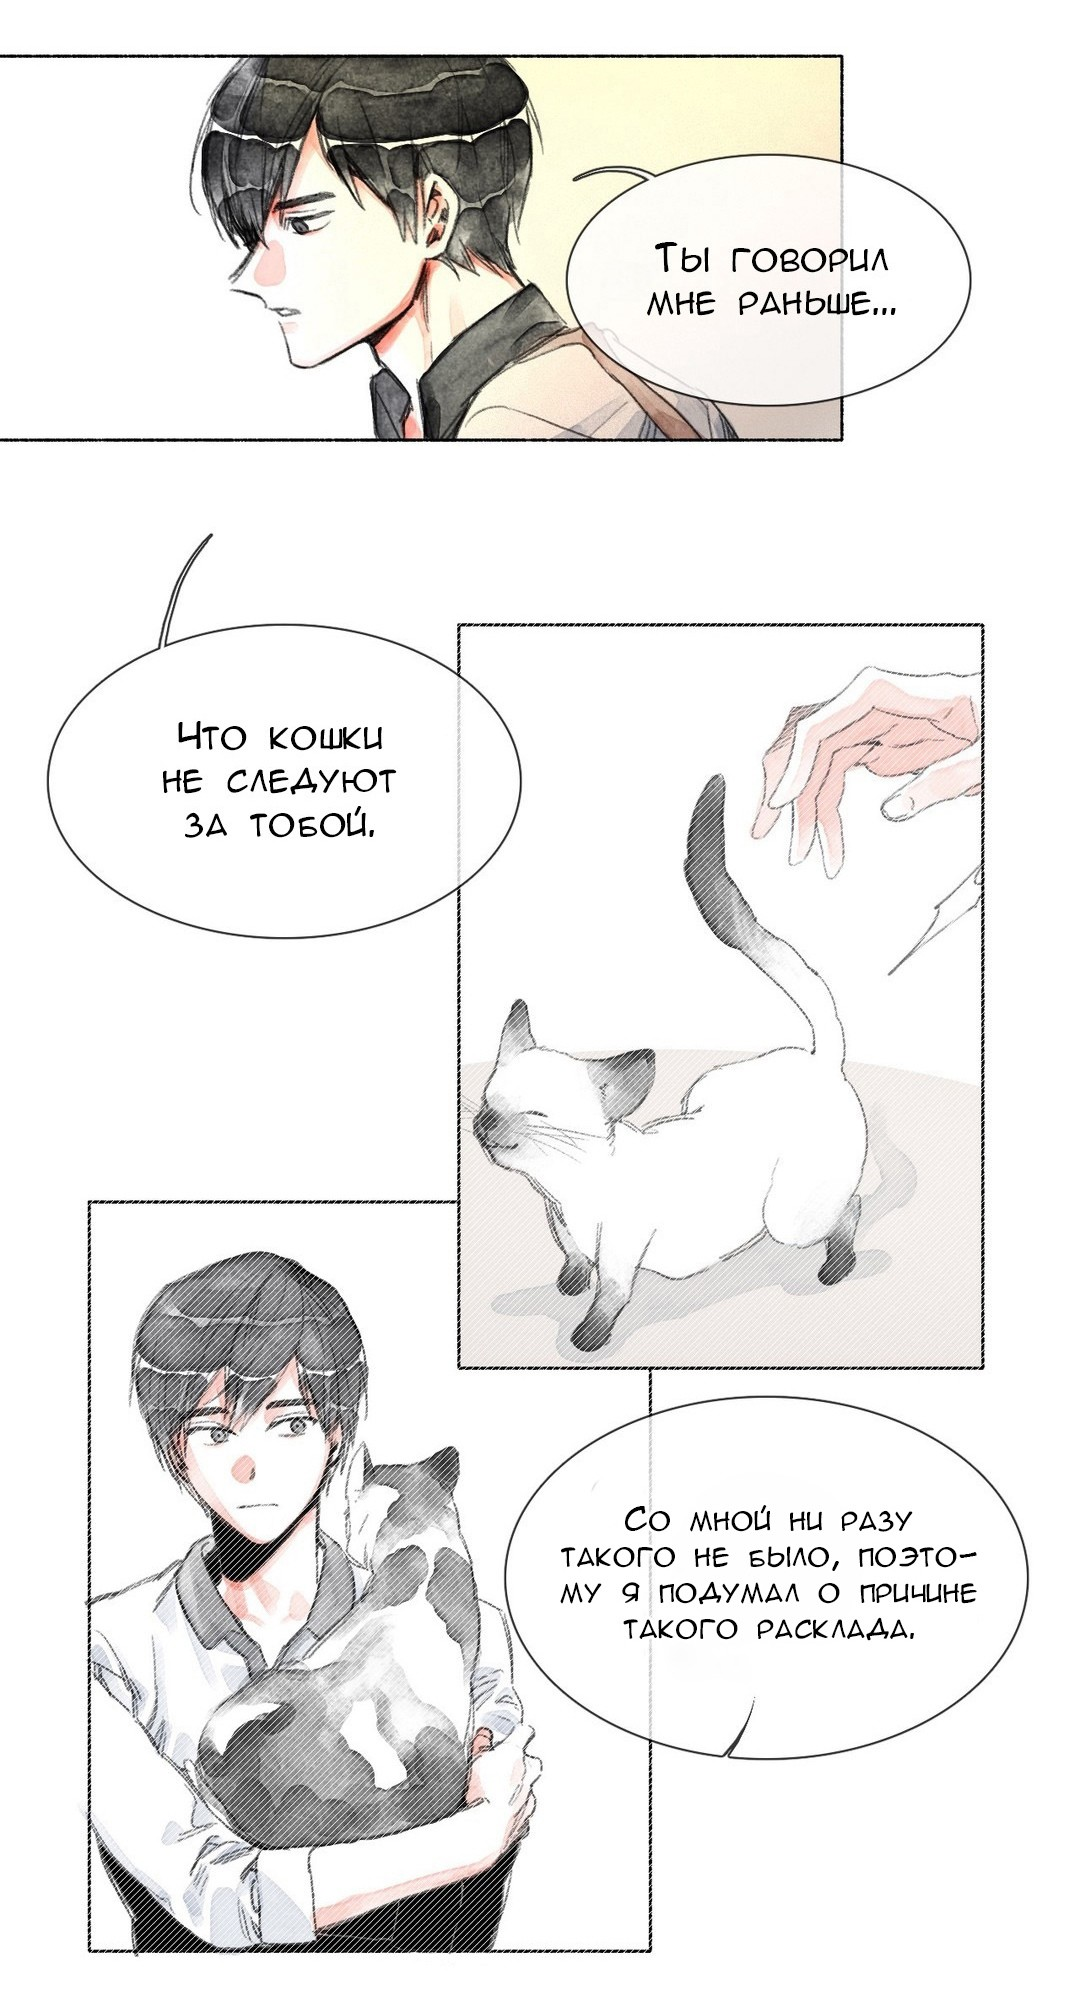 https://r2.ninemanga.com/comics/pic4/36/37860/1339494/1557622953699.jpg Page 4